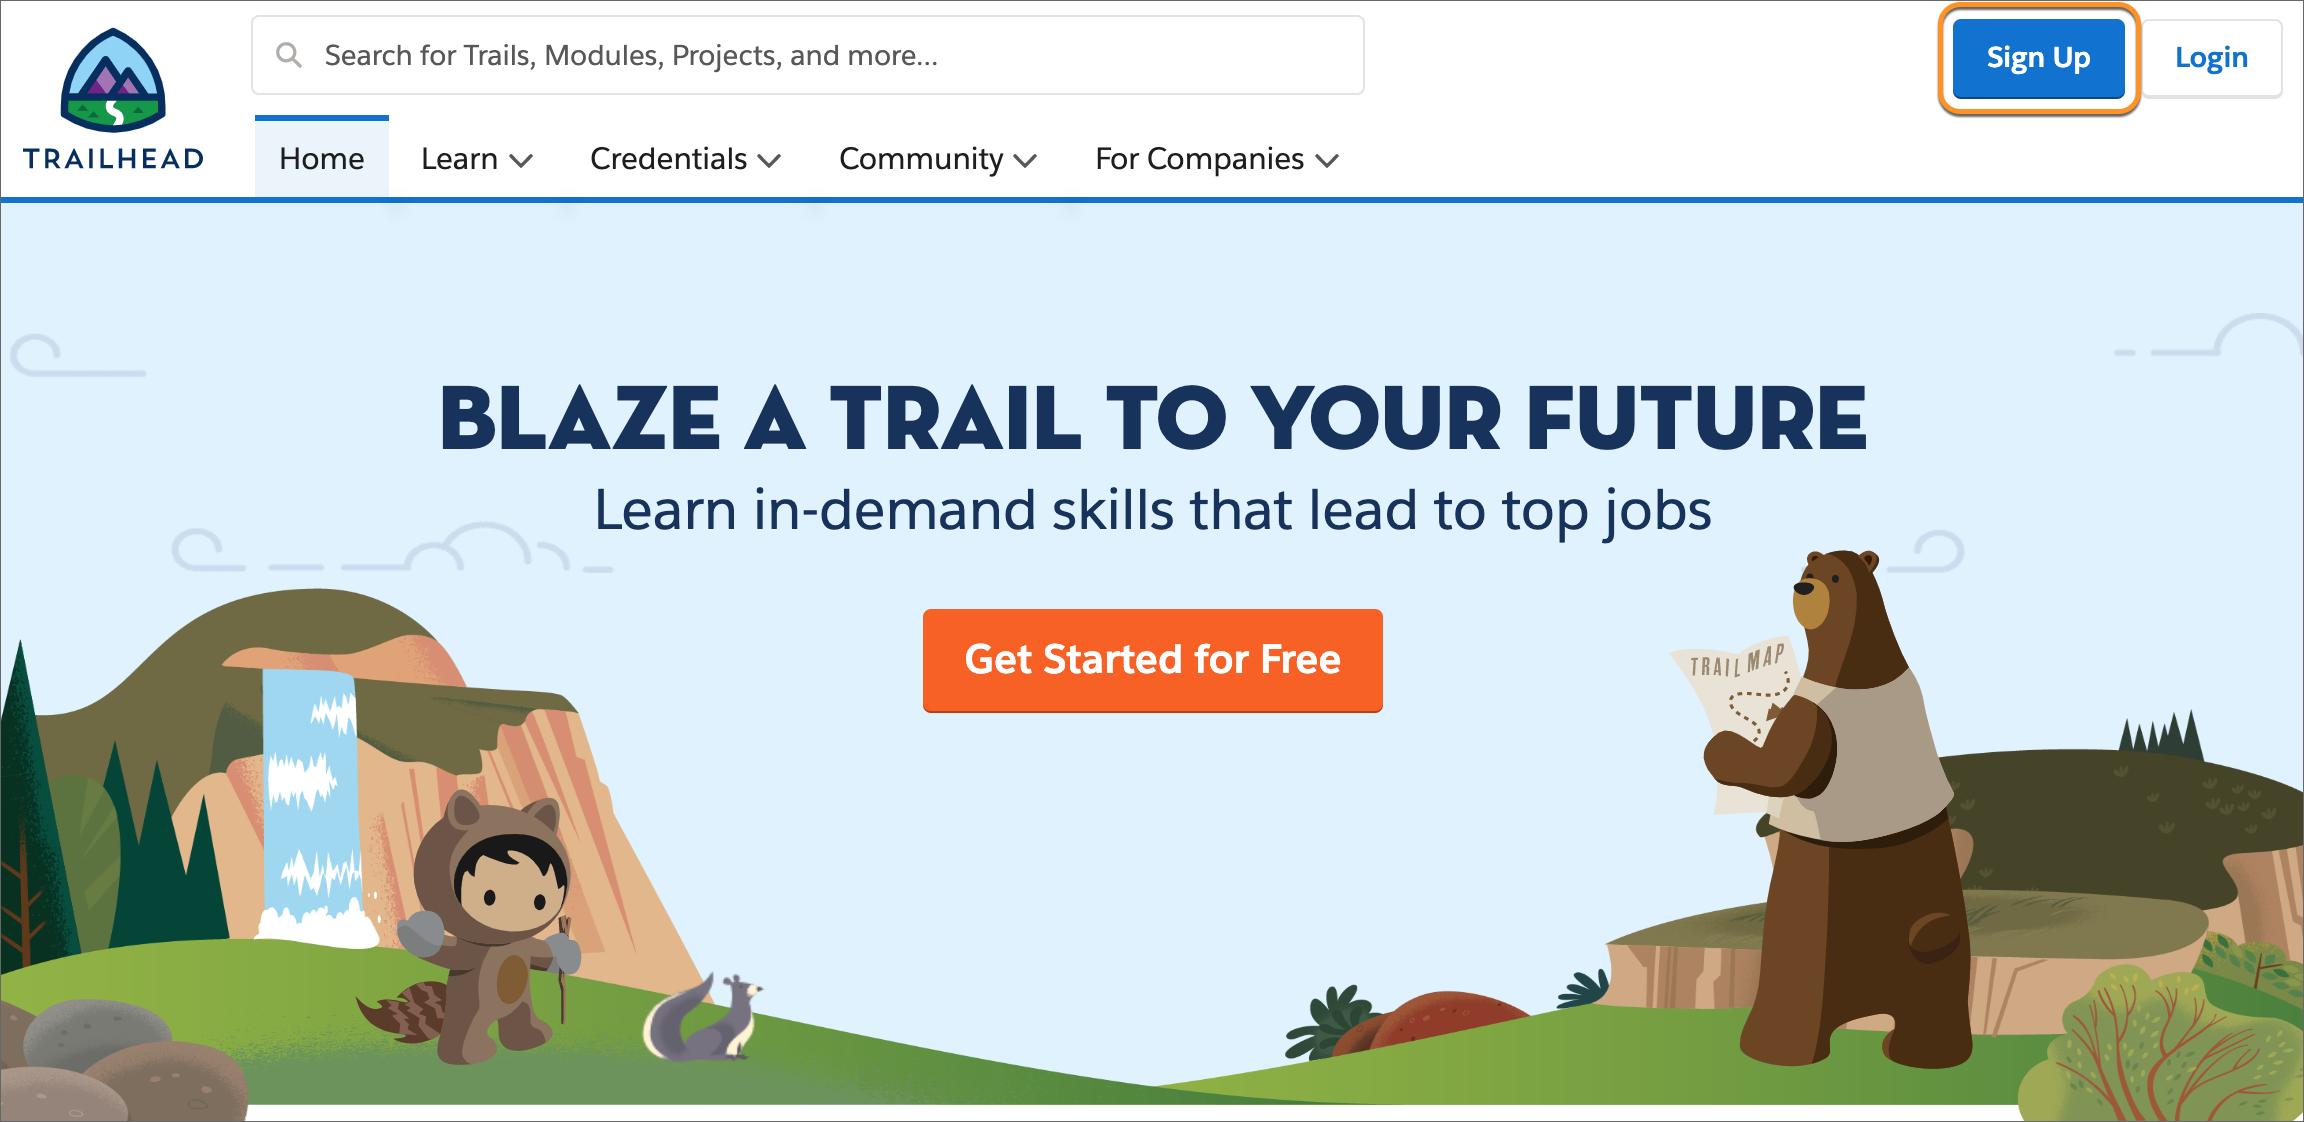 Trailhead のお知らせページ、[サインアップ] ボタンに囲み線が付いています。